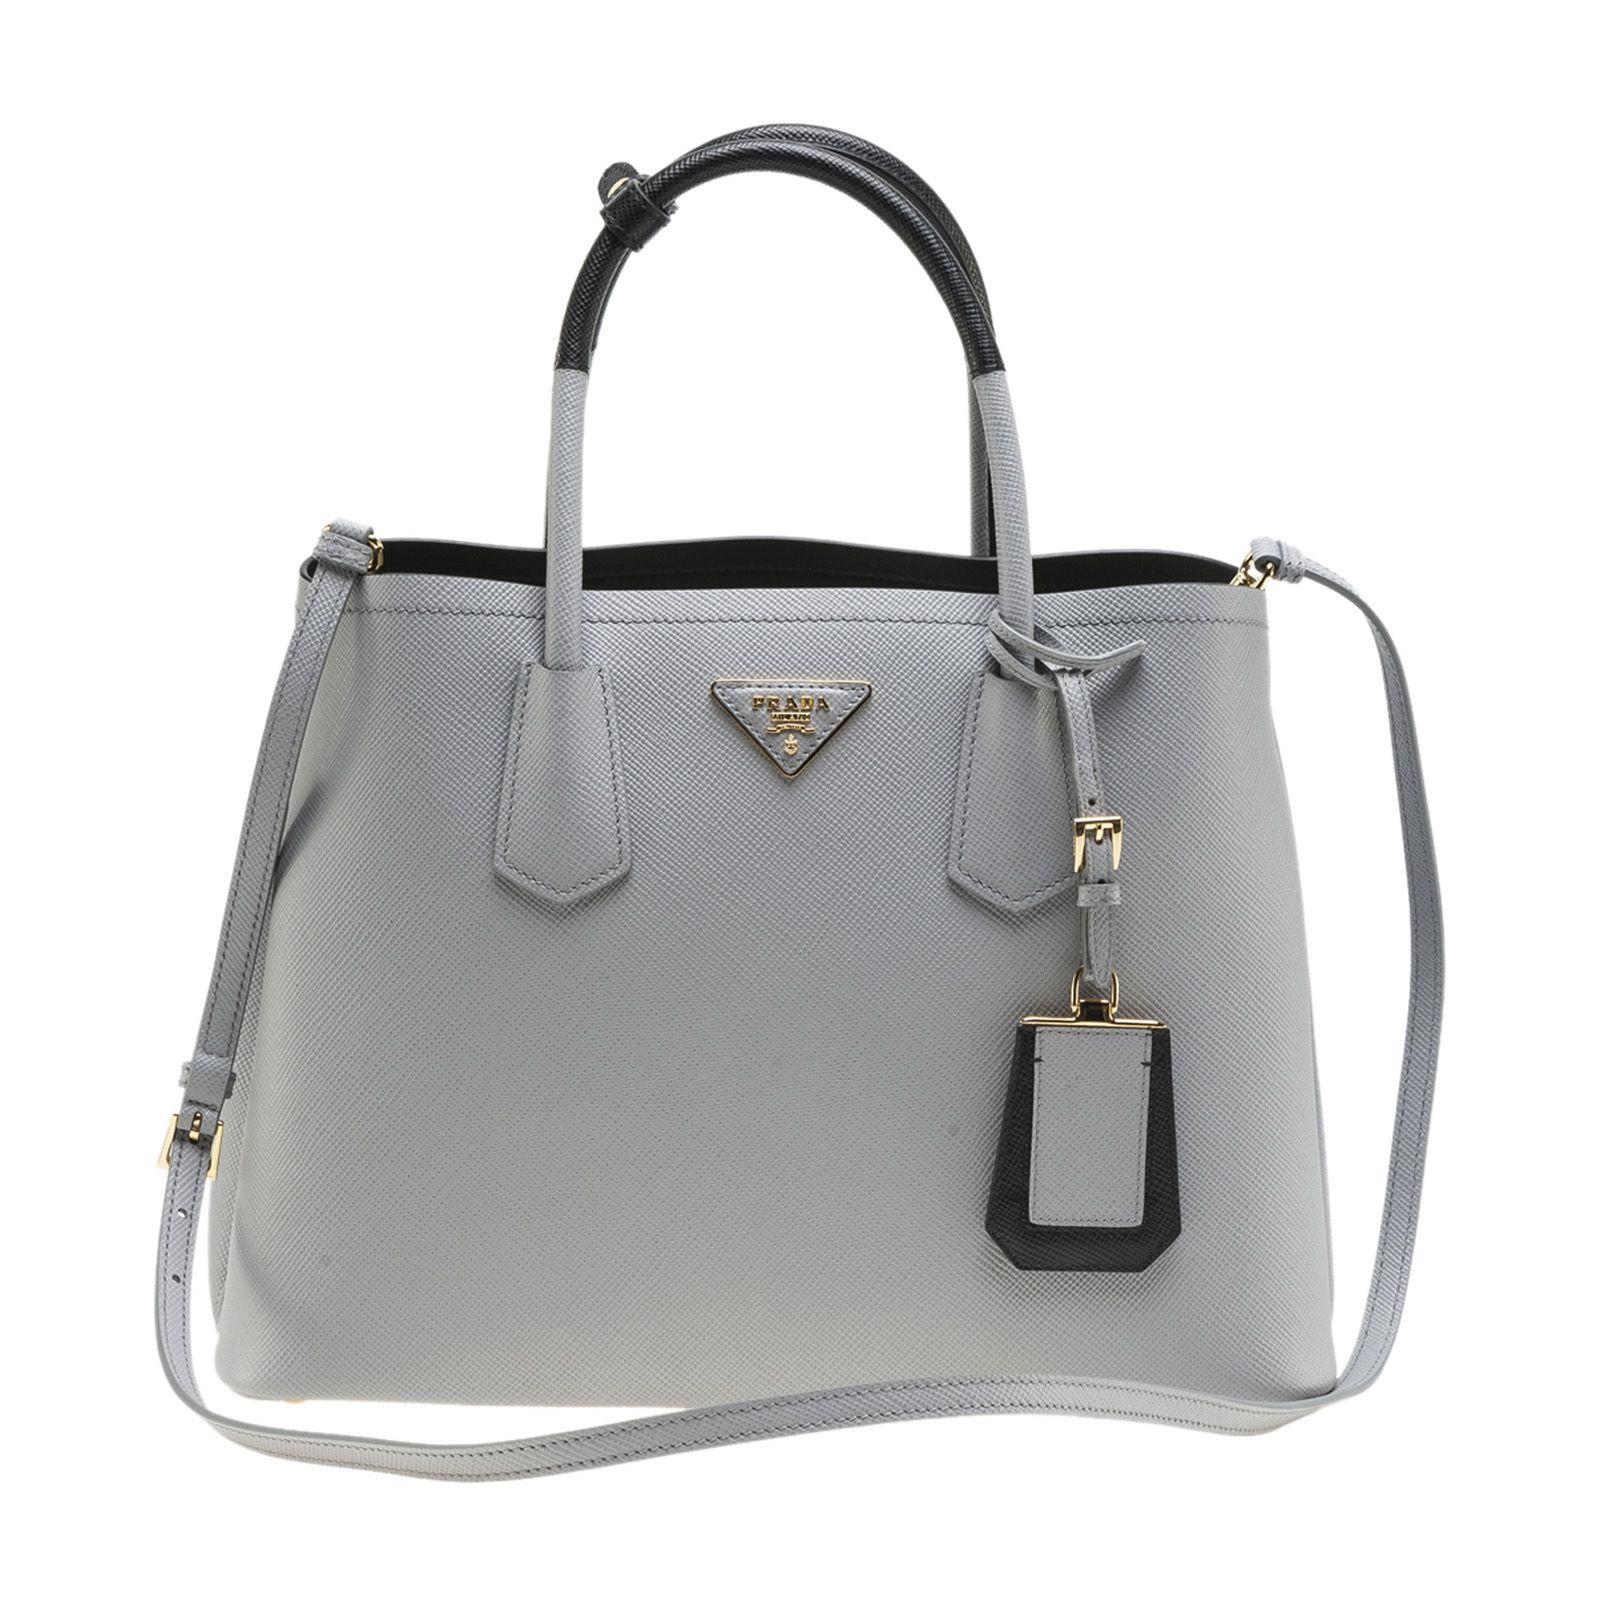 f699dbe5a548 Prada Medium Saffiano Greca Paradigm Tote Bags | Stanford Center for ...